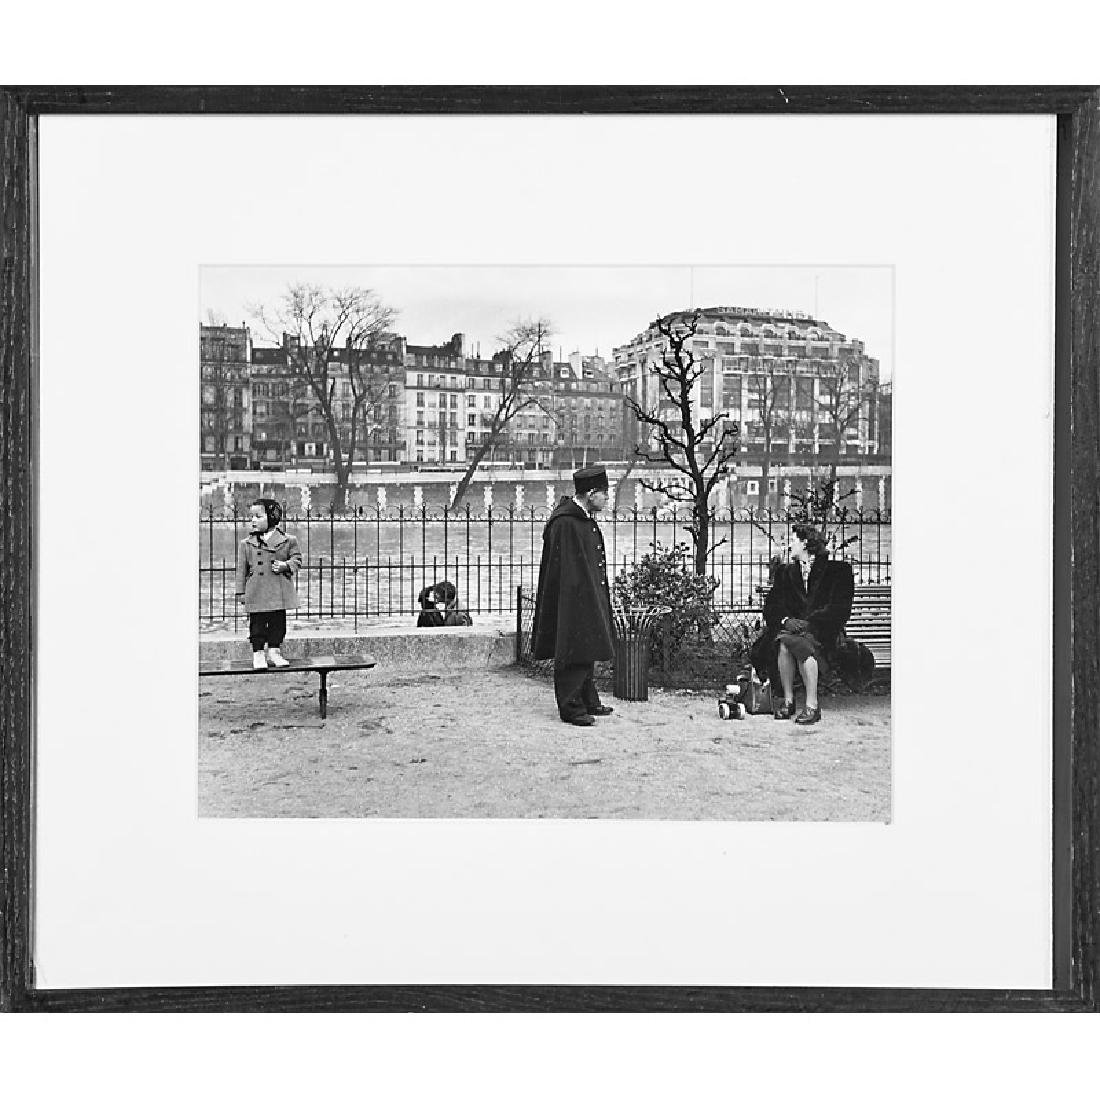 Robert Doisneau (French, 1912-1994) - 2